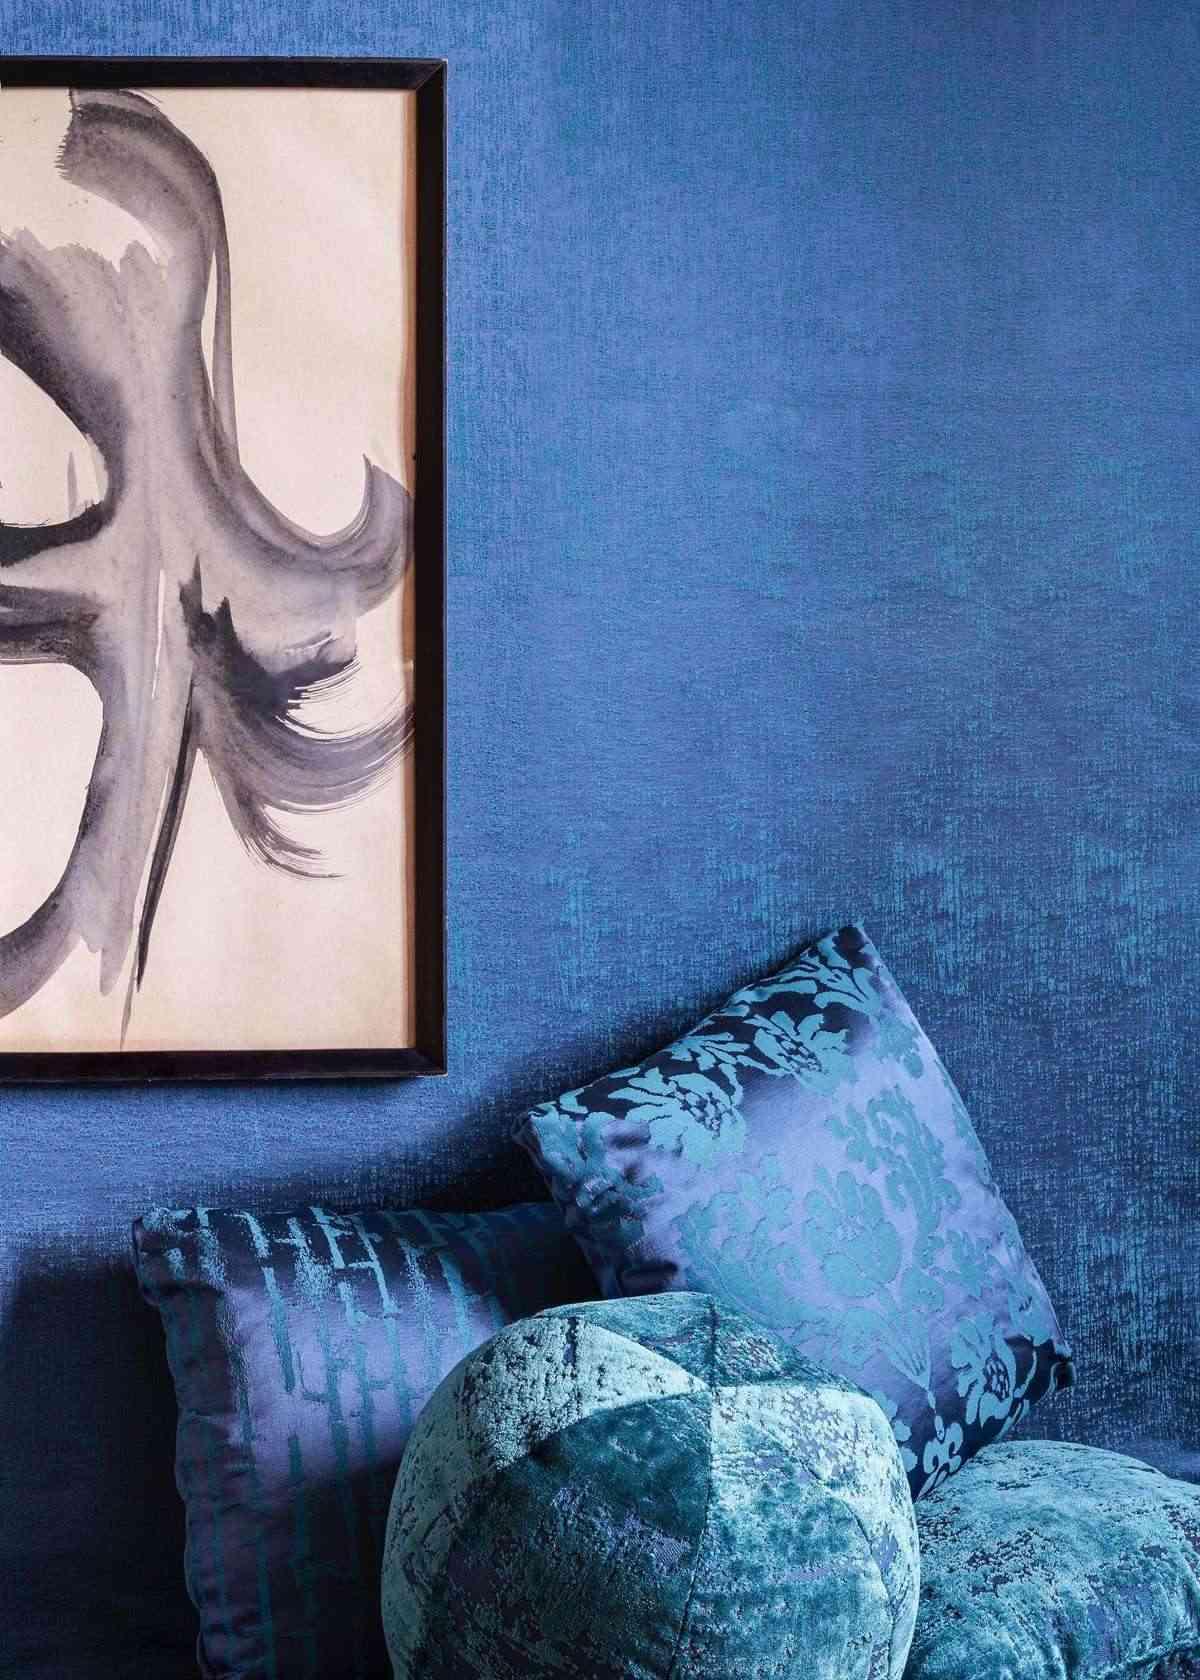 colecciones textiles - Modern Palace de Grancedo